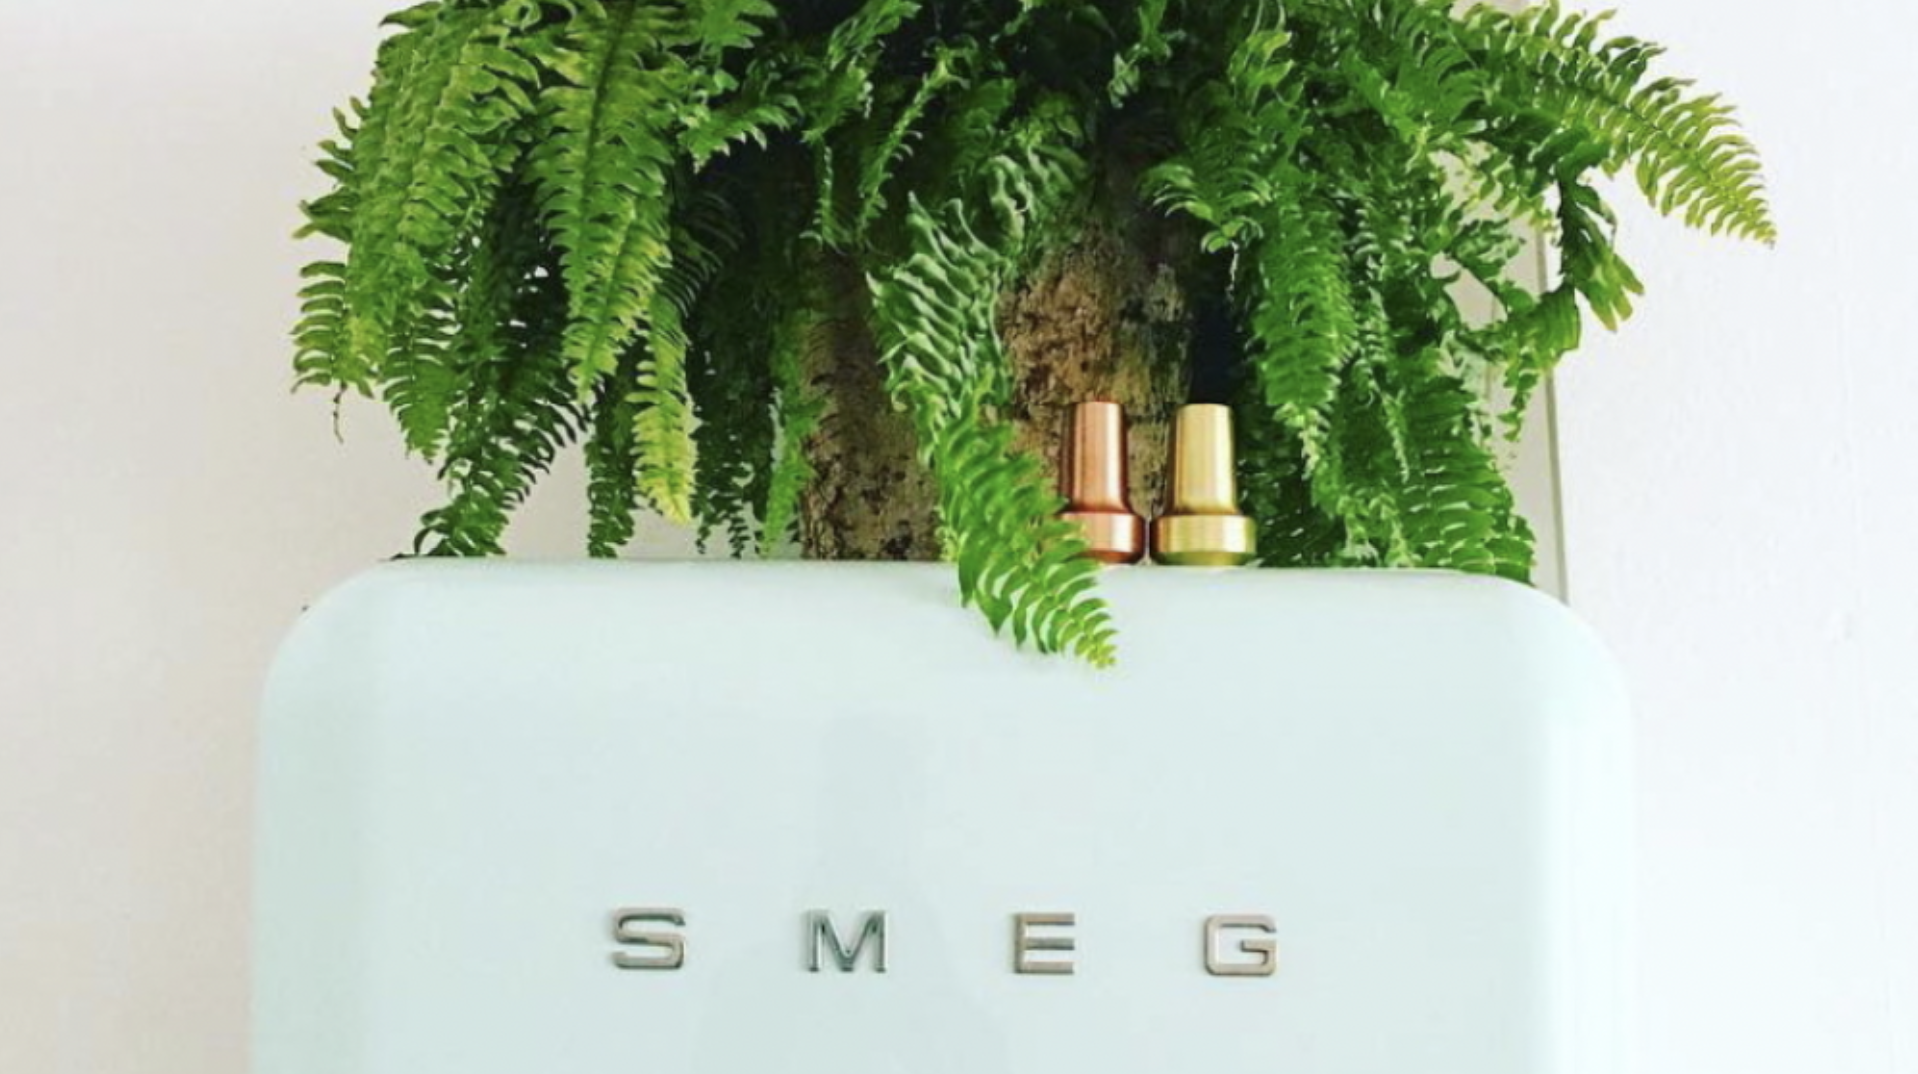 Go Green with Smeg